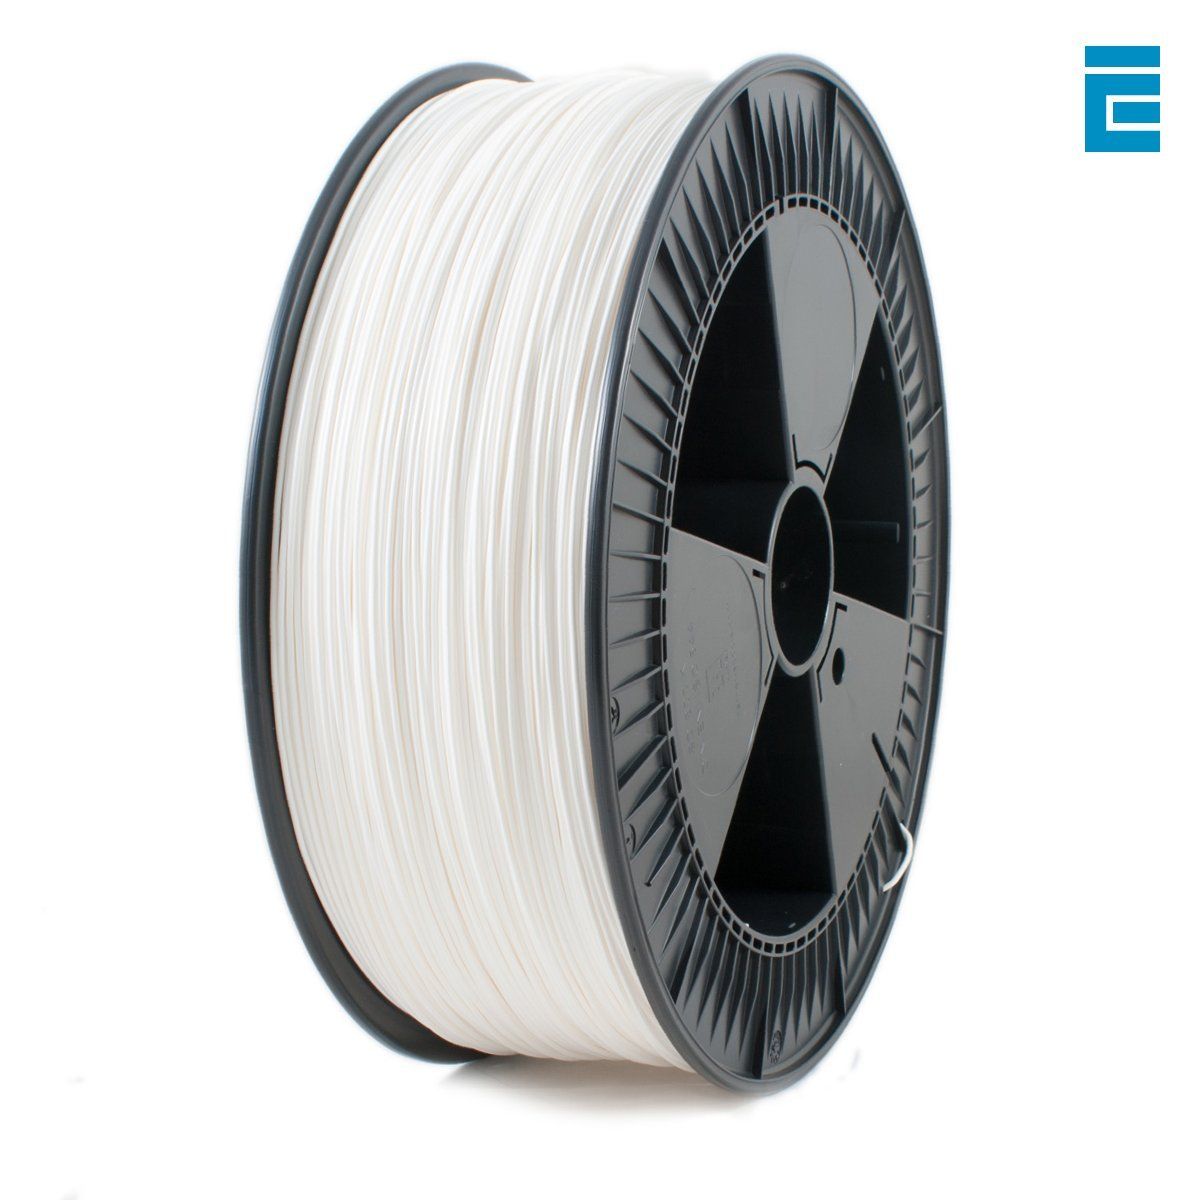 Ice Filaments ICEFIL1PLA118 Filamento PLA 1.75mm, 2.30kg, Bianco Dutch Filaments